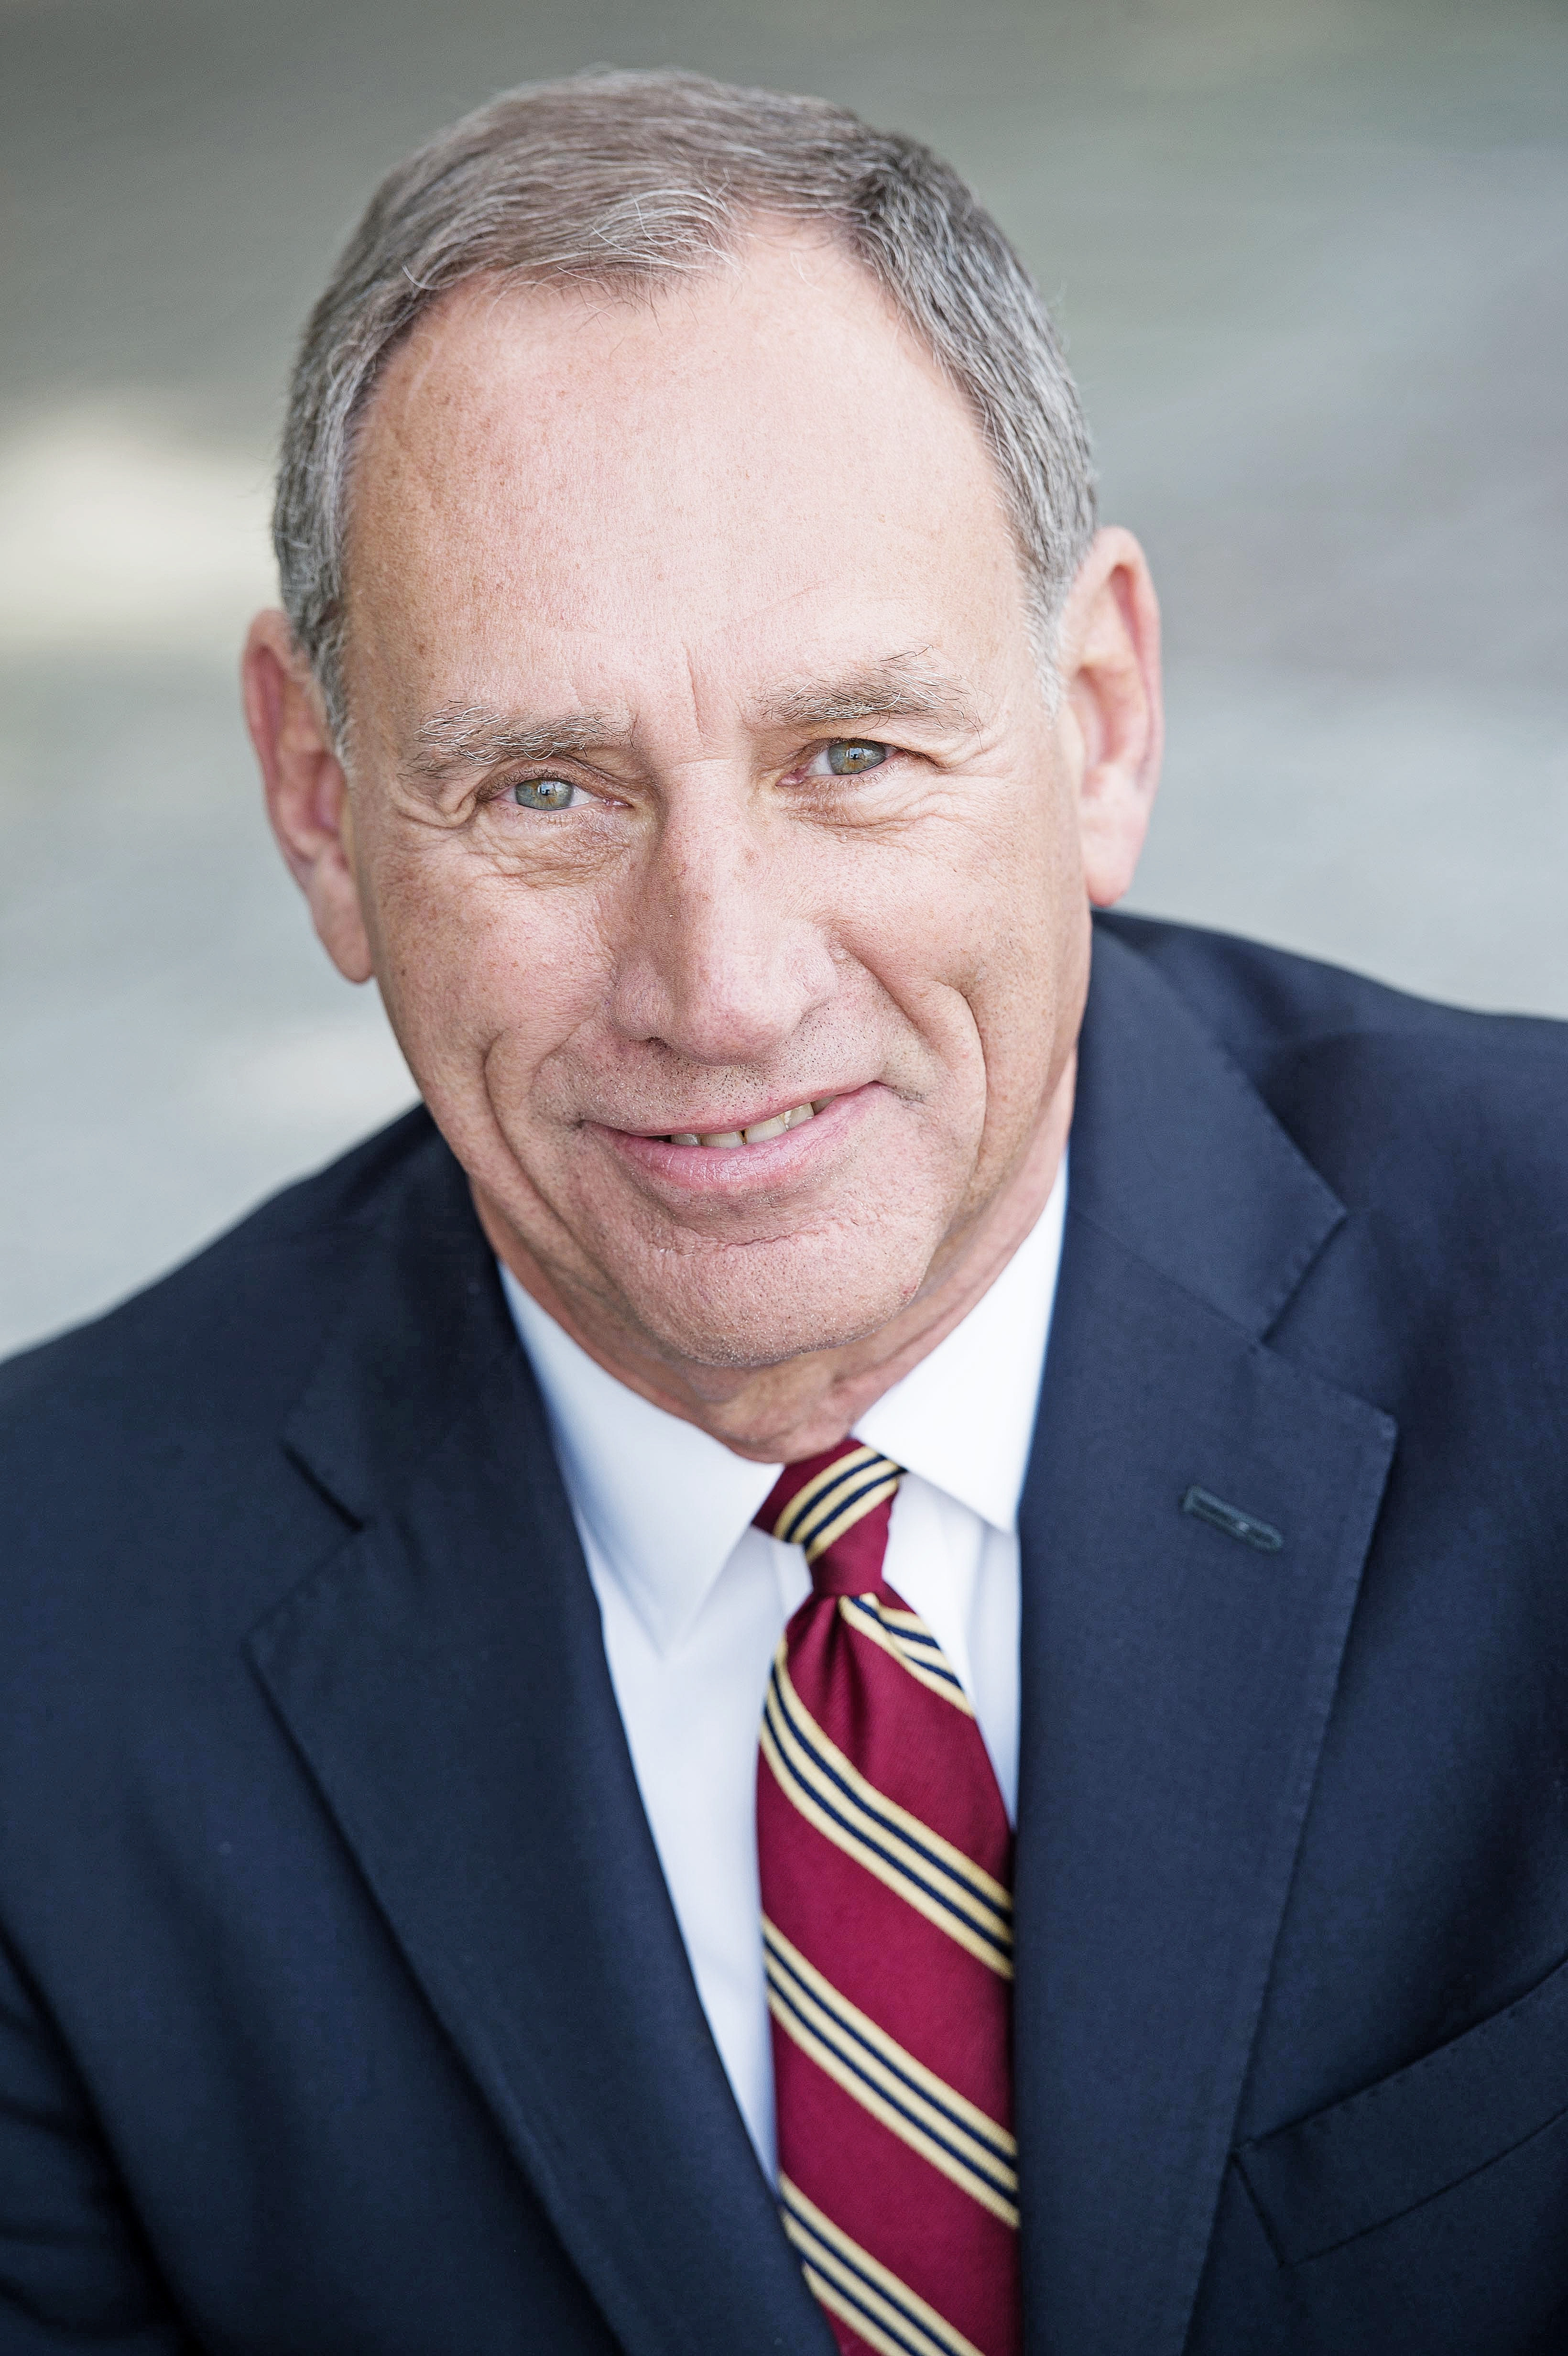 cardiac surgeon Dr. Toby Cosgrove